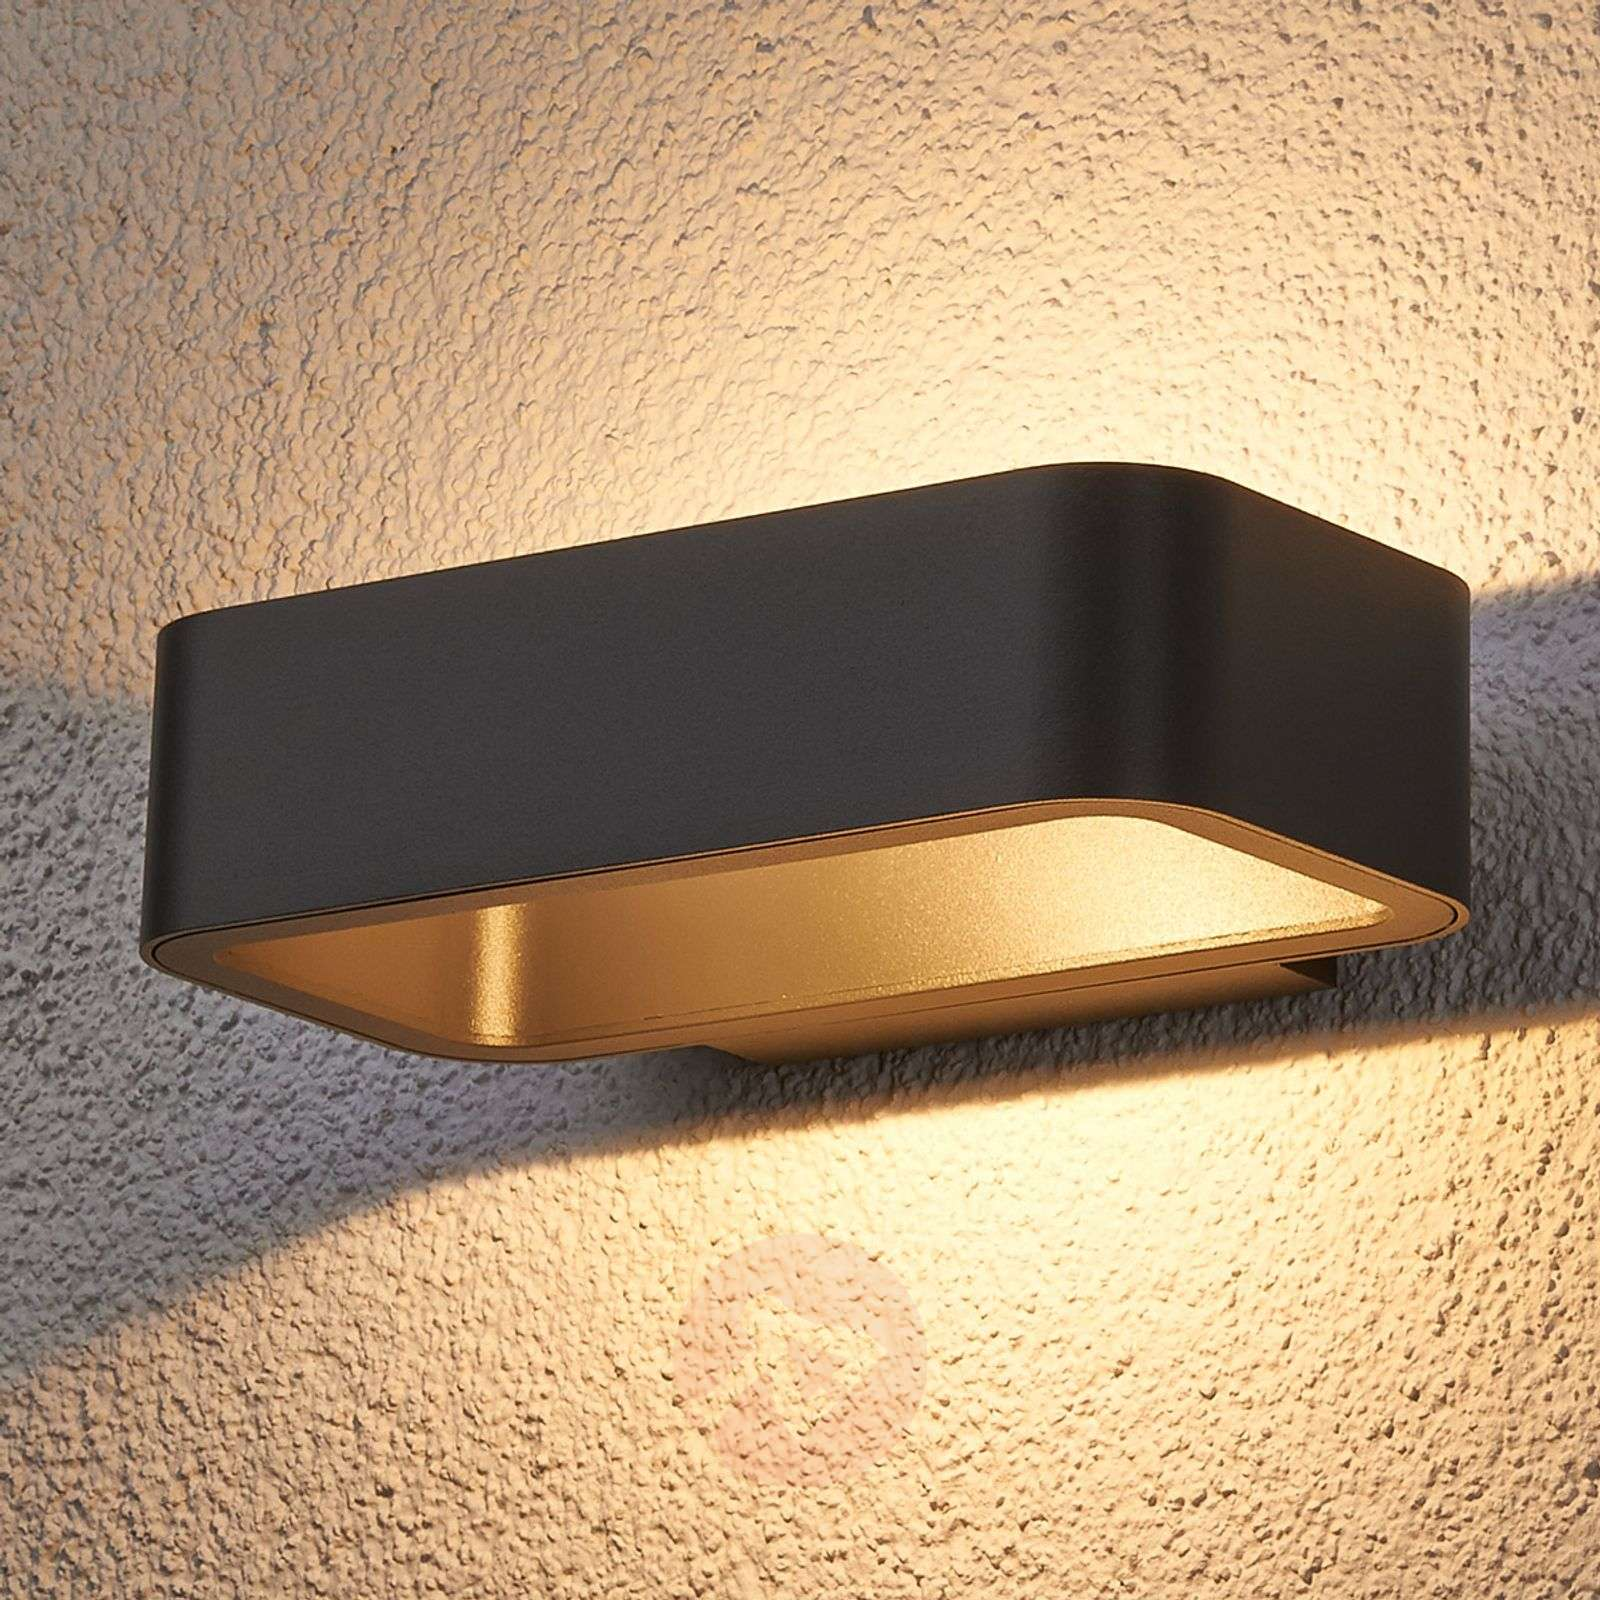 Jami LED outdoor wall light made of aluminium-9616028-01